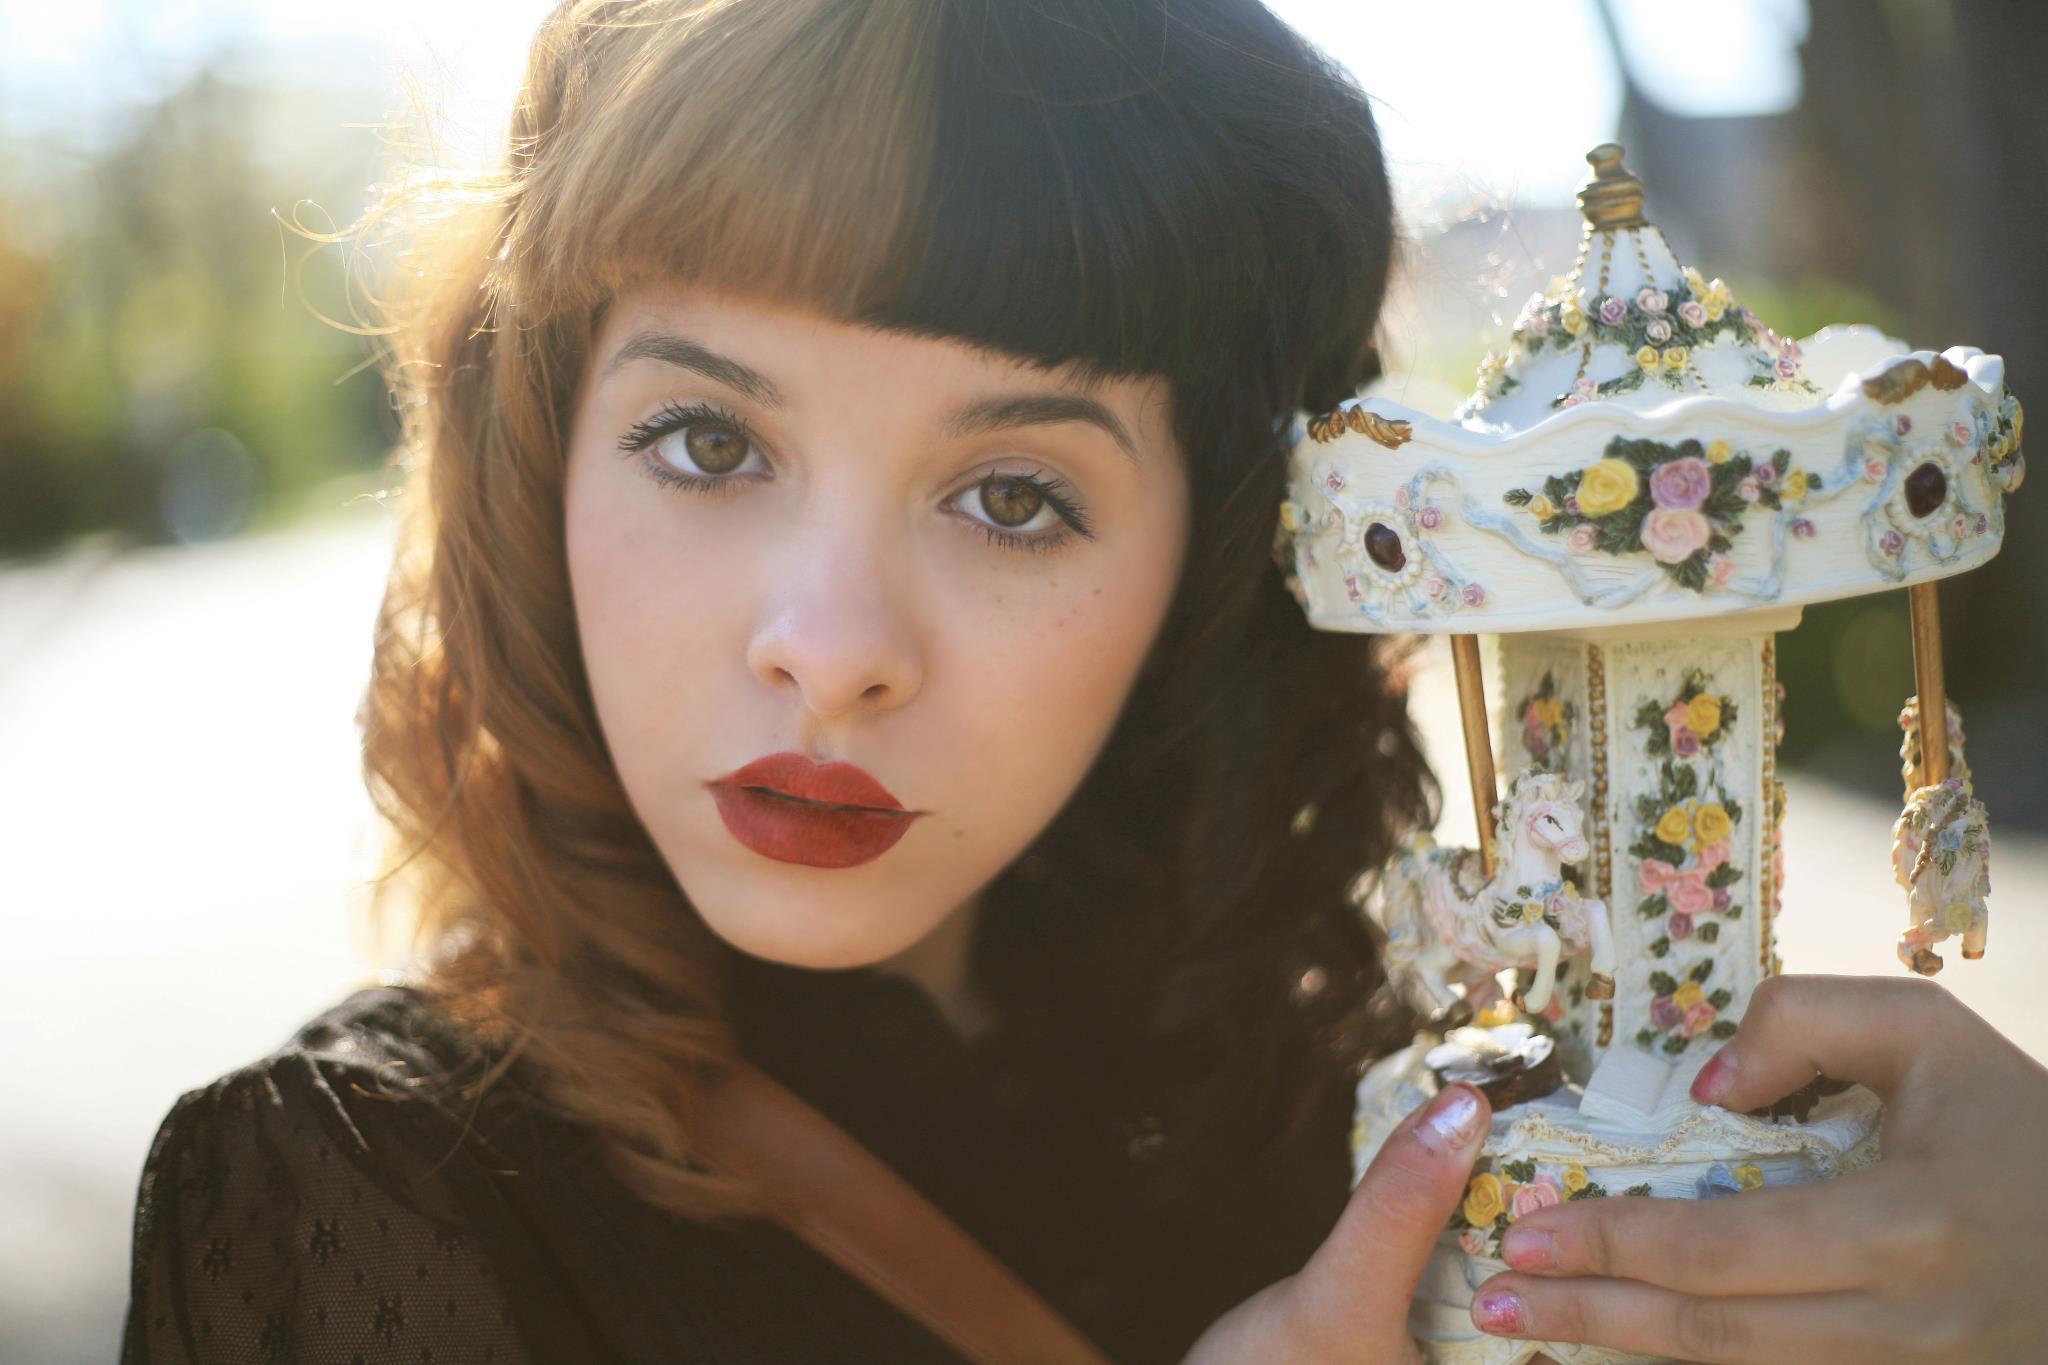 Pictures Of Melanie Martinez